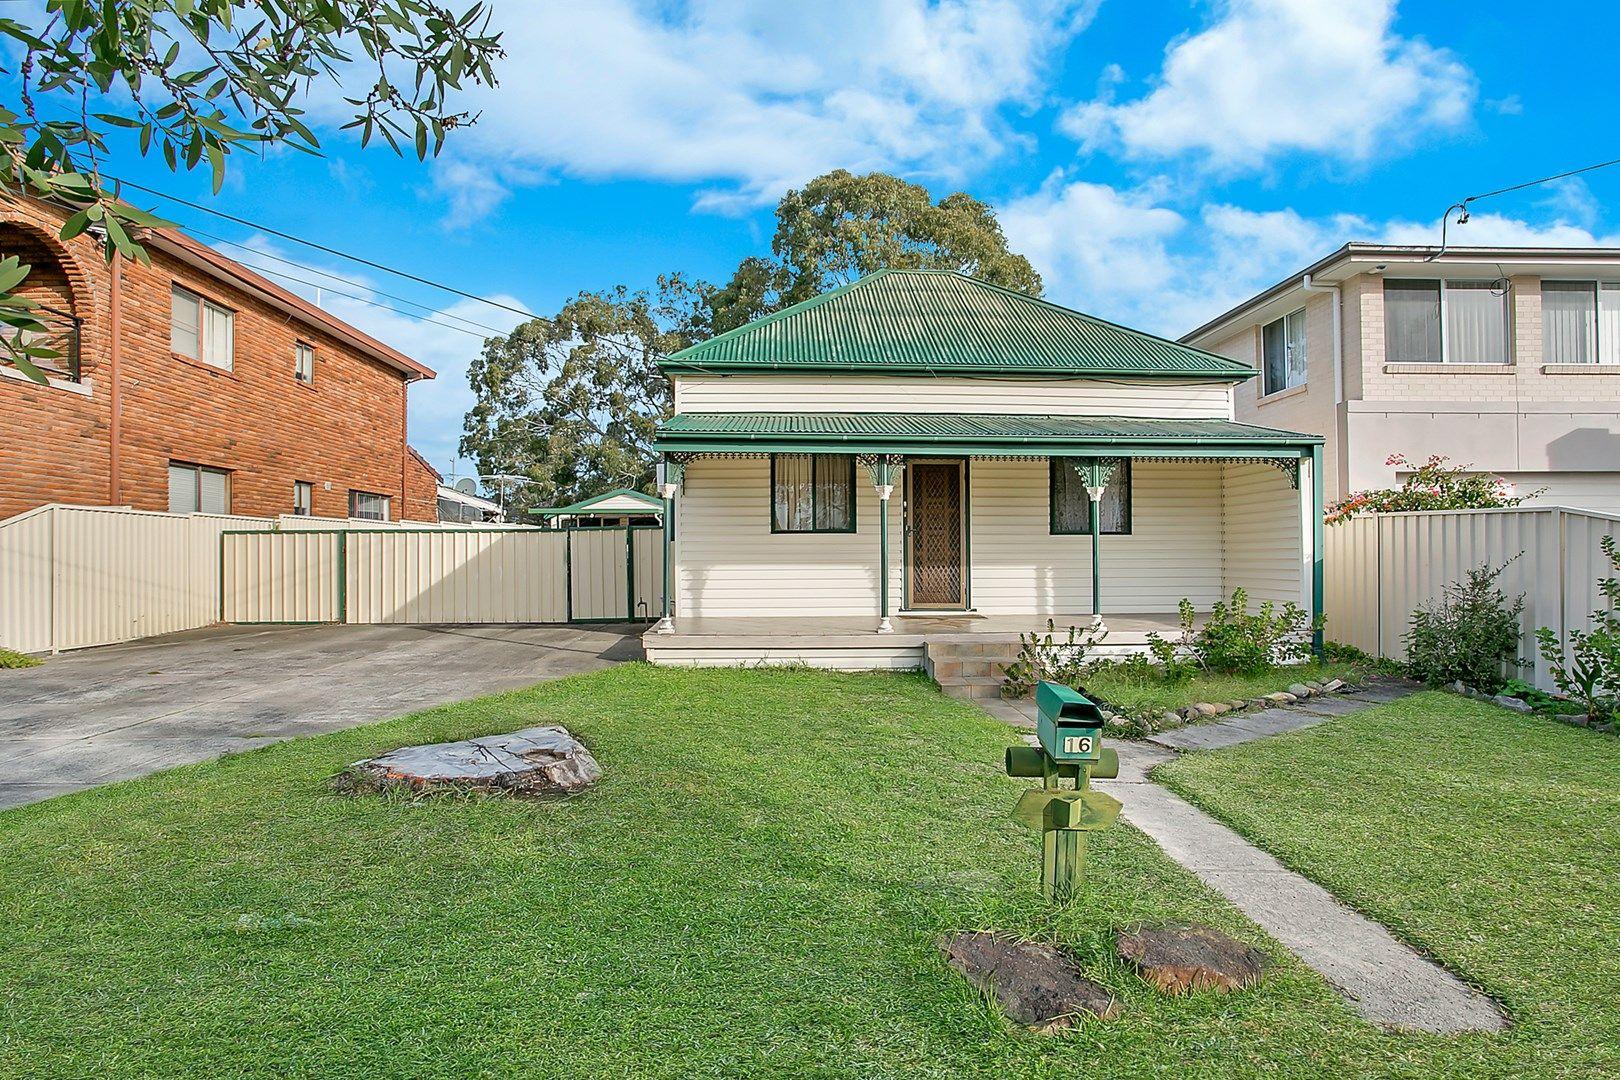 16 Winchmore  Street, Merrylands NSW 2160, Image 0